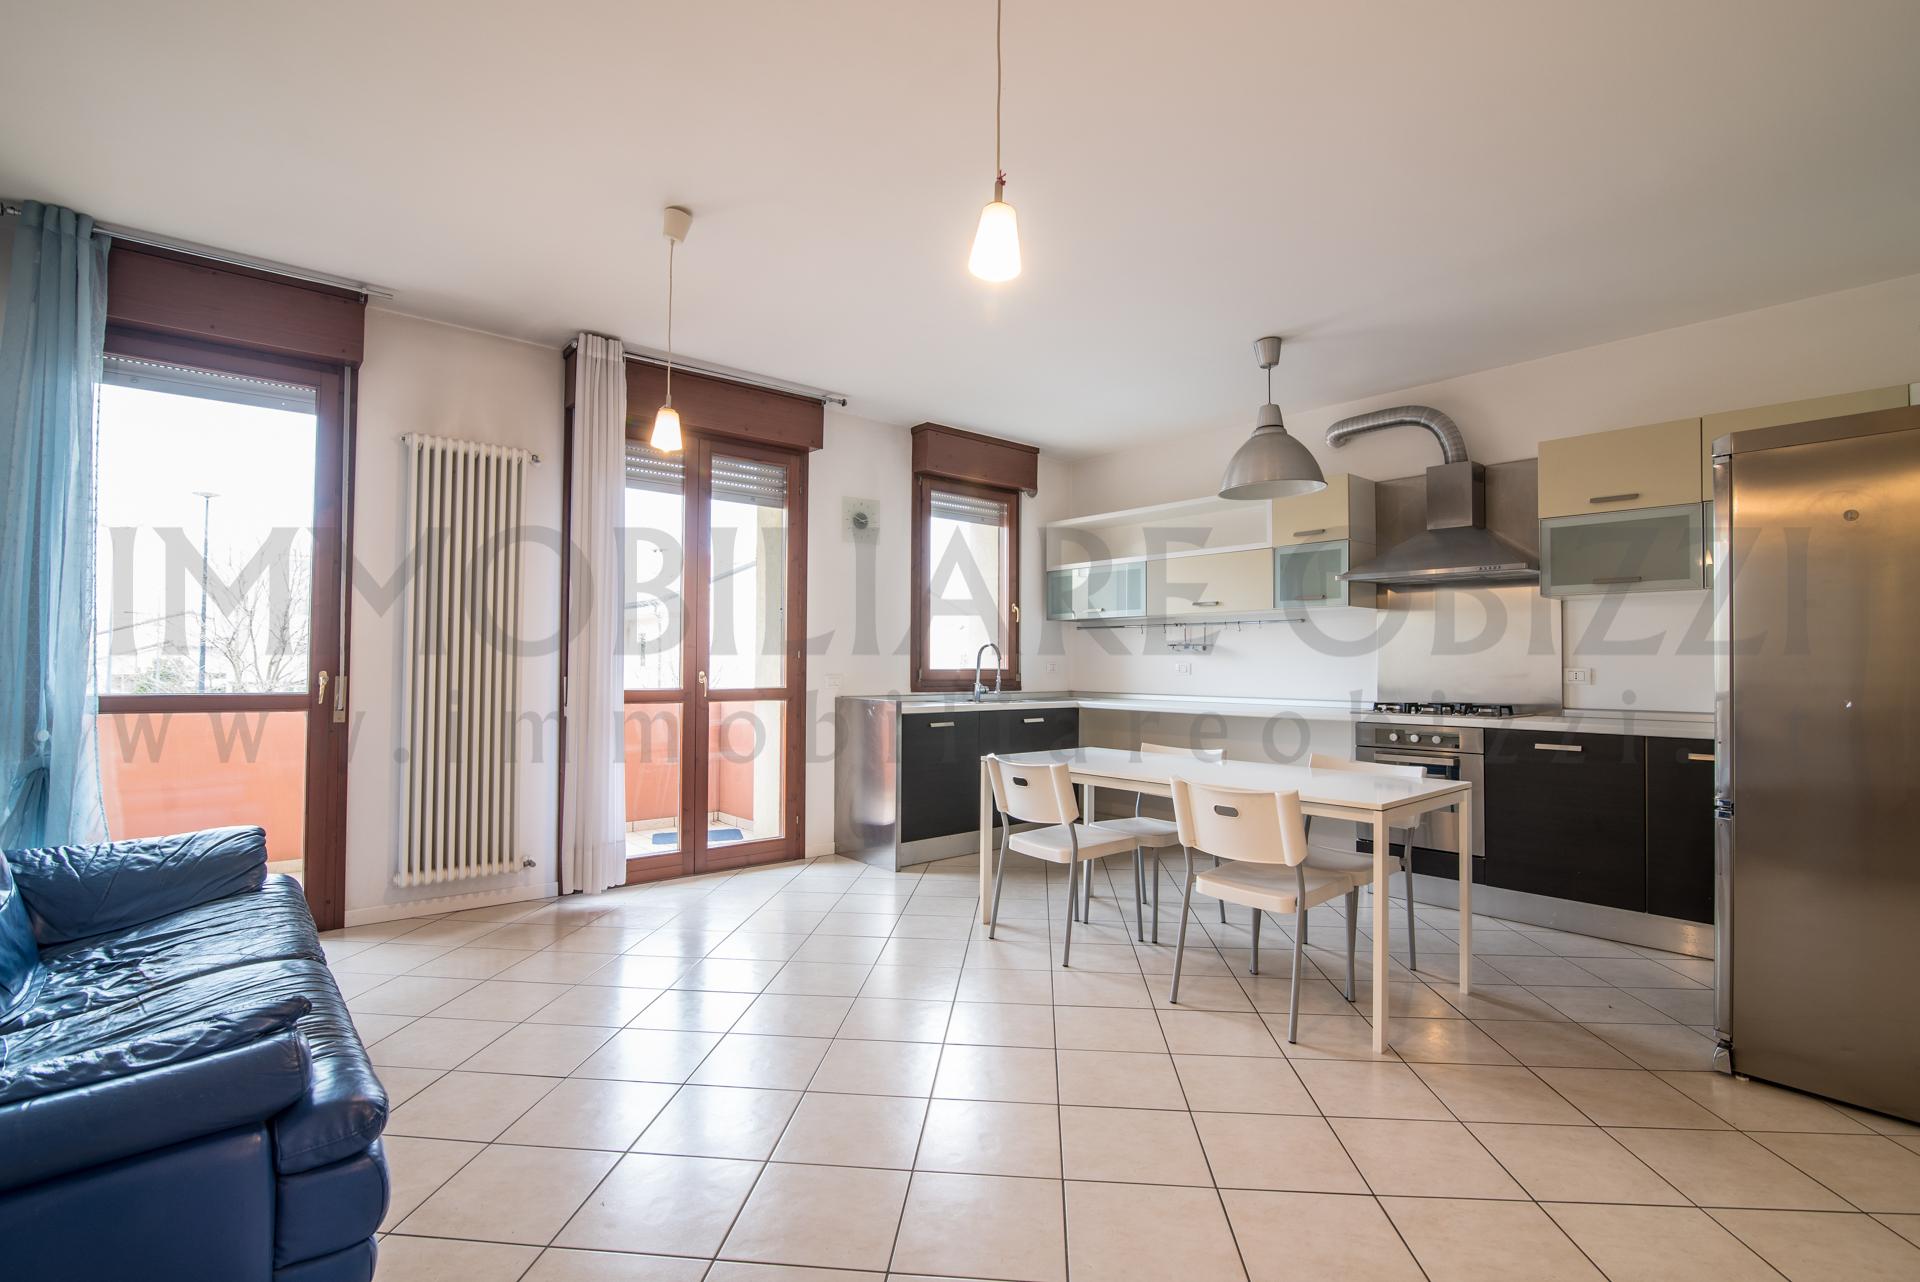 ALBIGNASEGO-Appartamento tre camere-